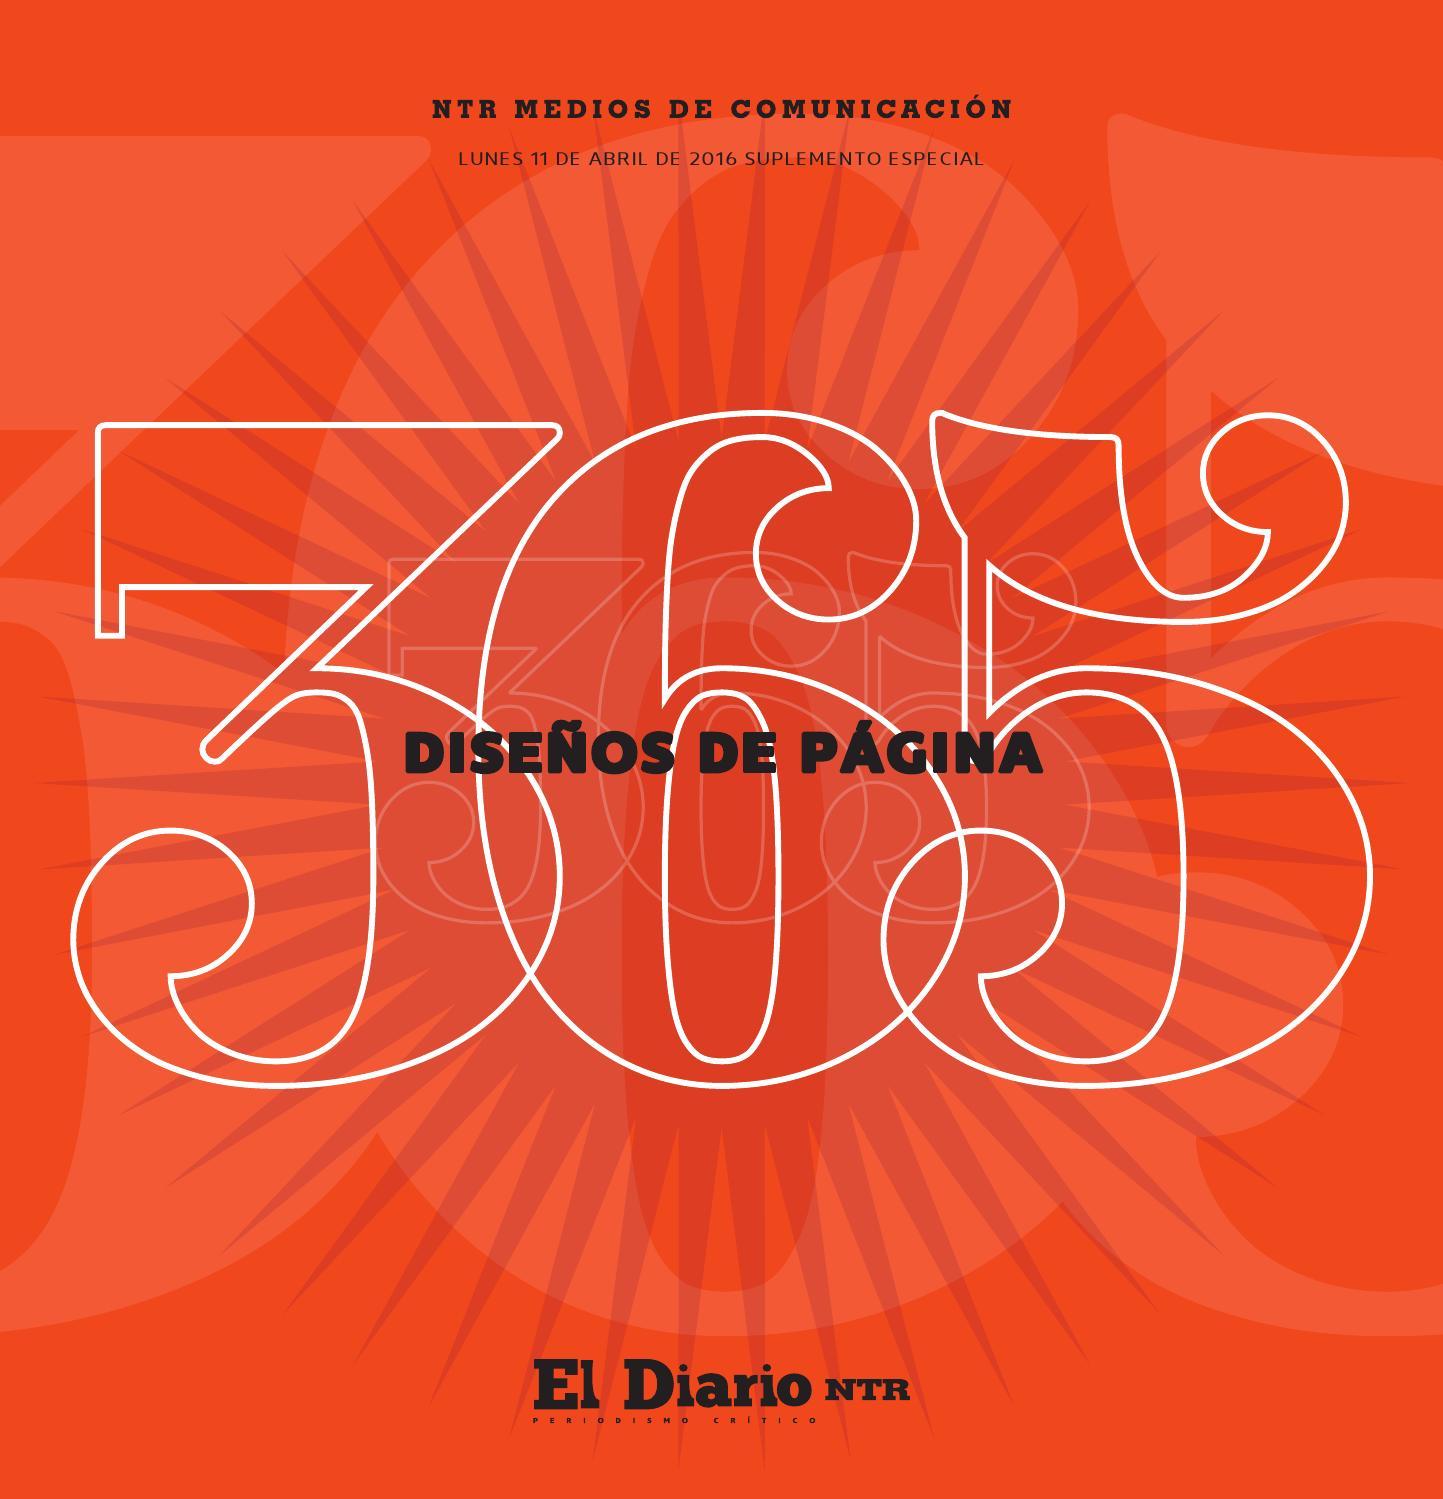 dc1f578d1fa 365 diseños de página by NTR Guadalajara - issuu